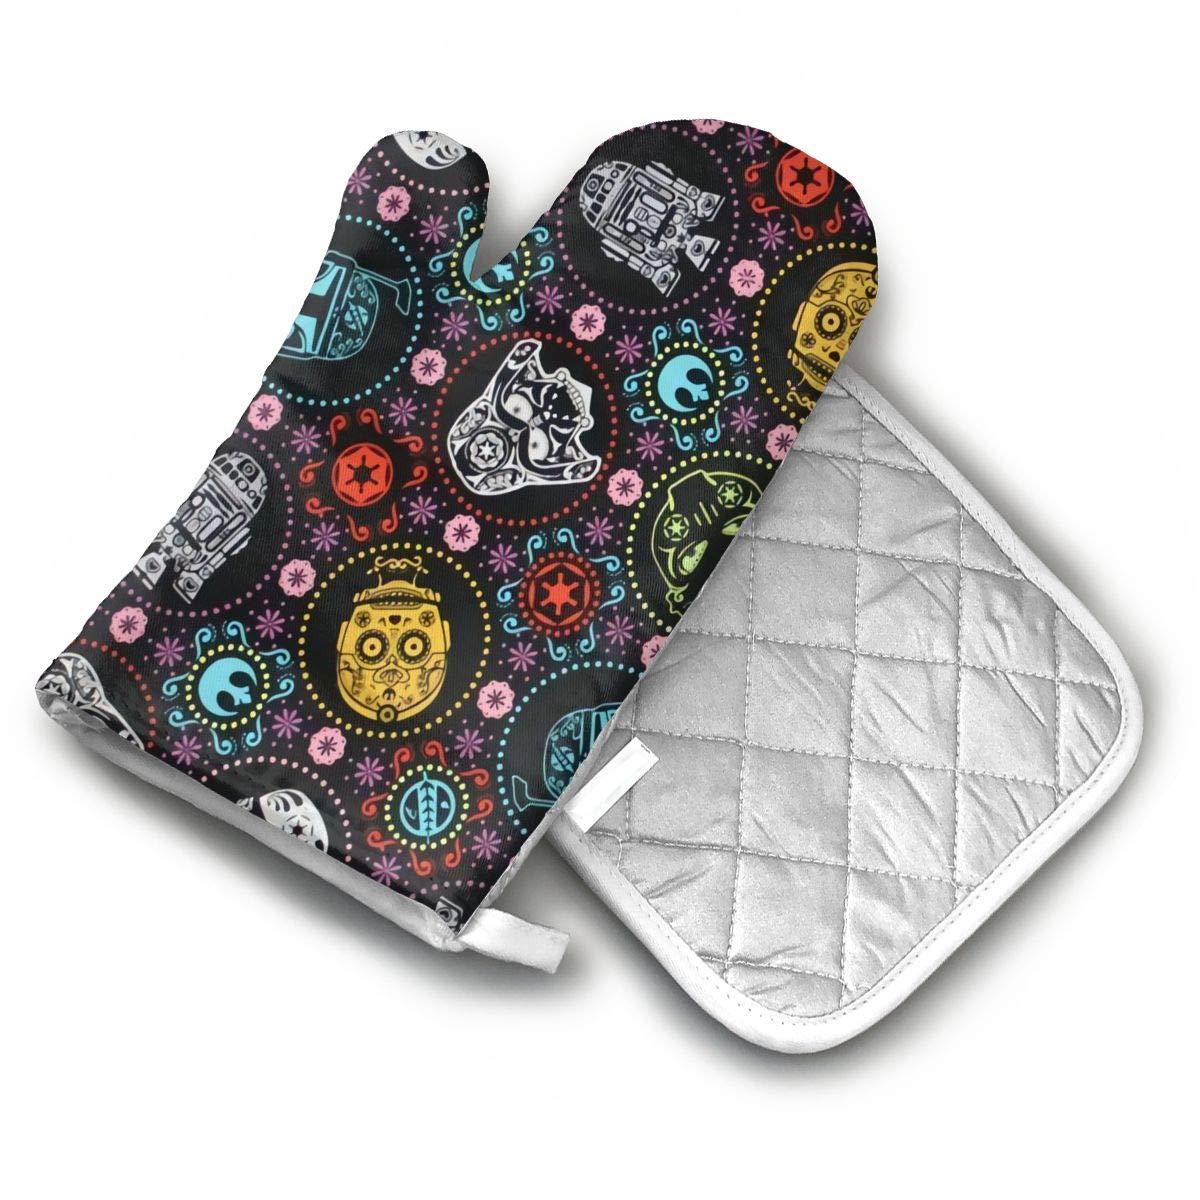 AISDHAJKSD Star Wars Premium Terylene/Nylon Oven Mitts and Pot Mat,Pot Mat/Hot Pads, Heat Resistant Gloves BBQ Kitchen